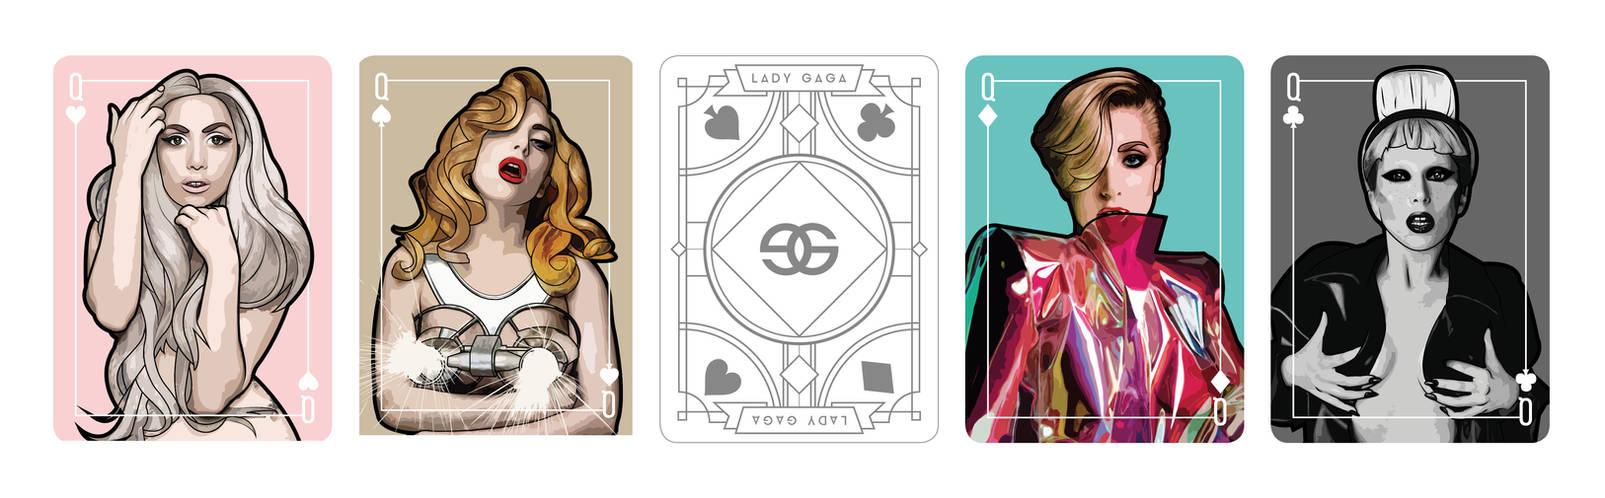 Lady Gaga playing card Queen set